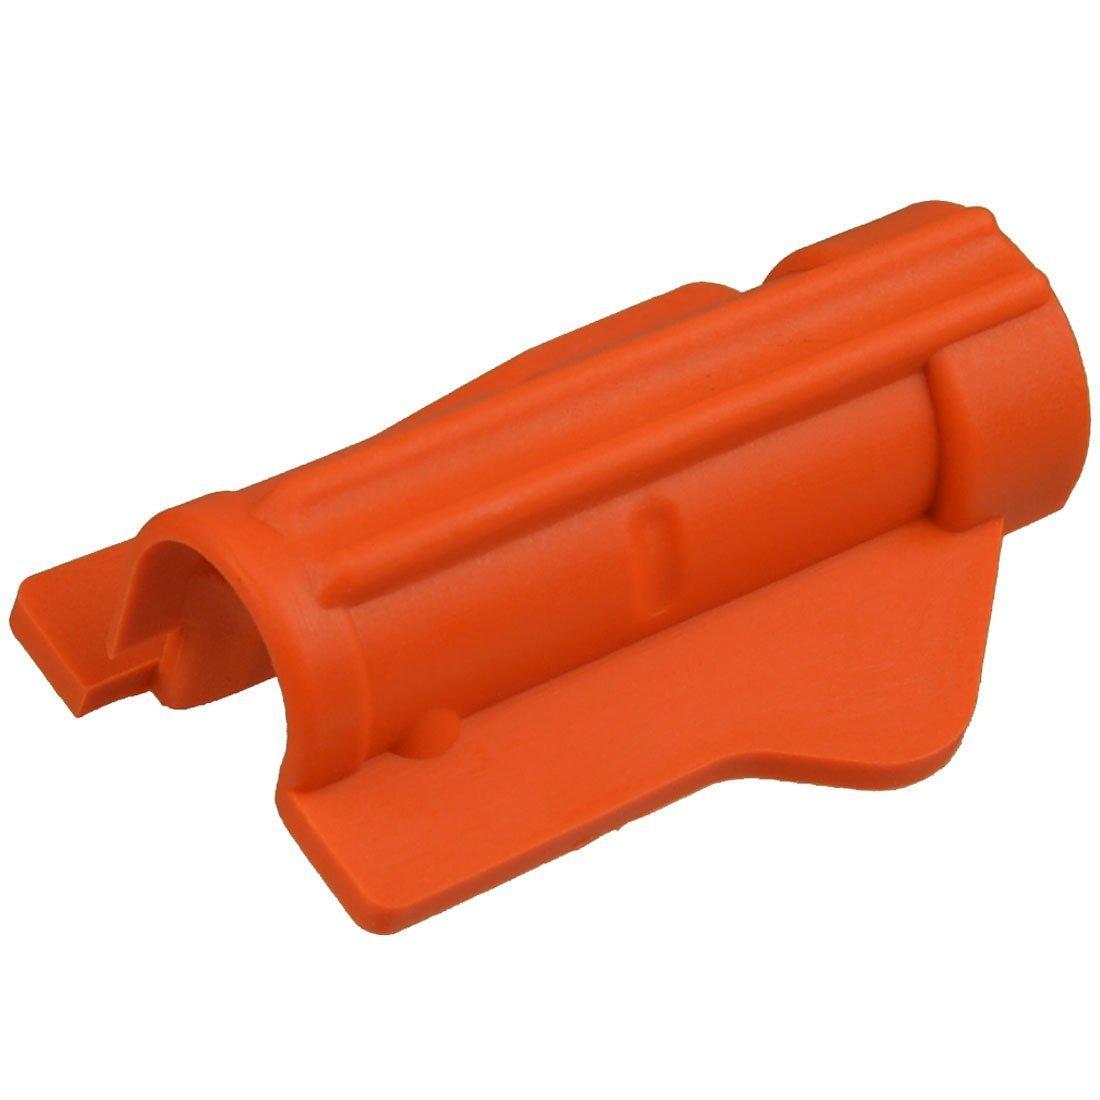 Field Sport M1 Garand Receiver Insert, Safety and Maintenance for the M1 Garand, Bright Orange